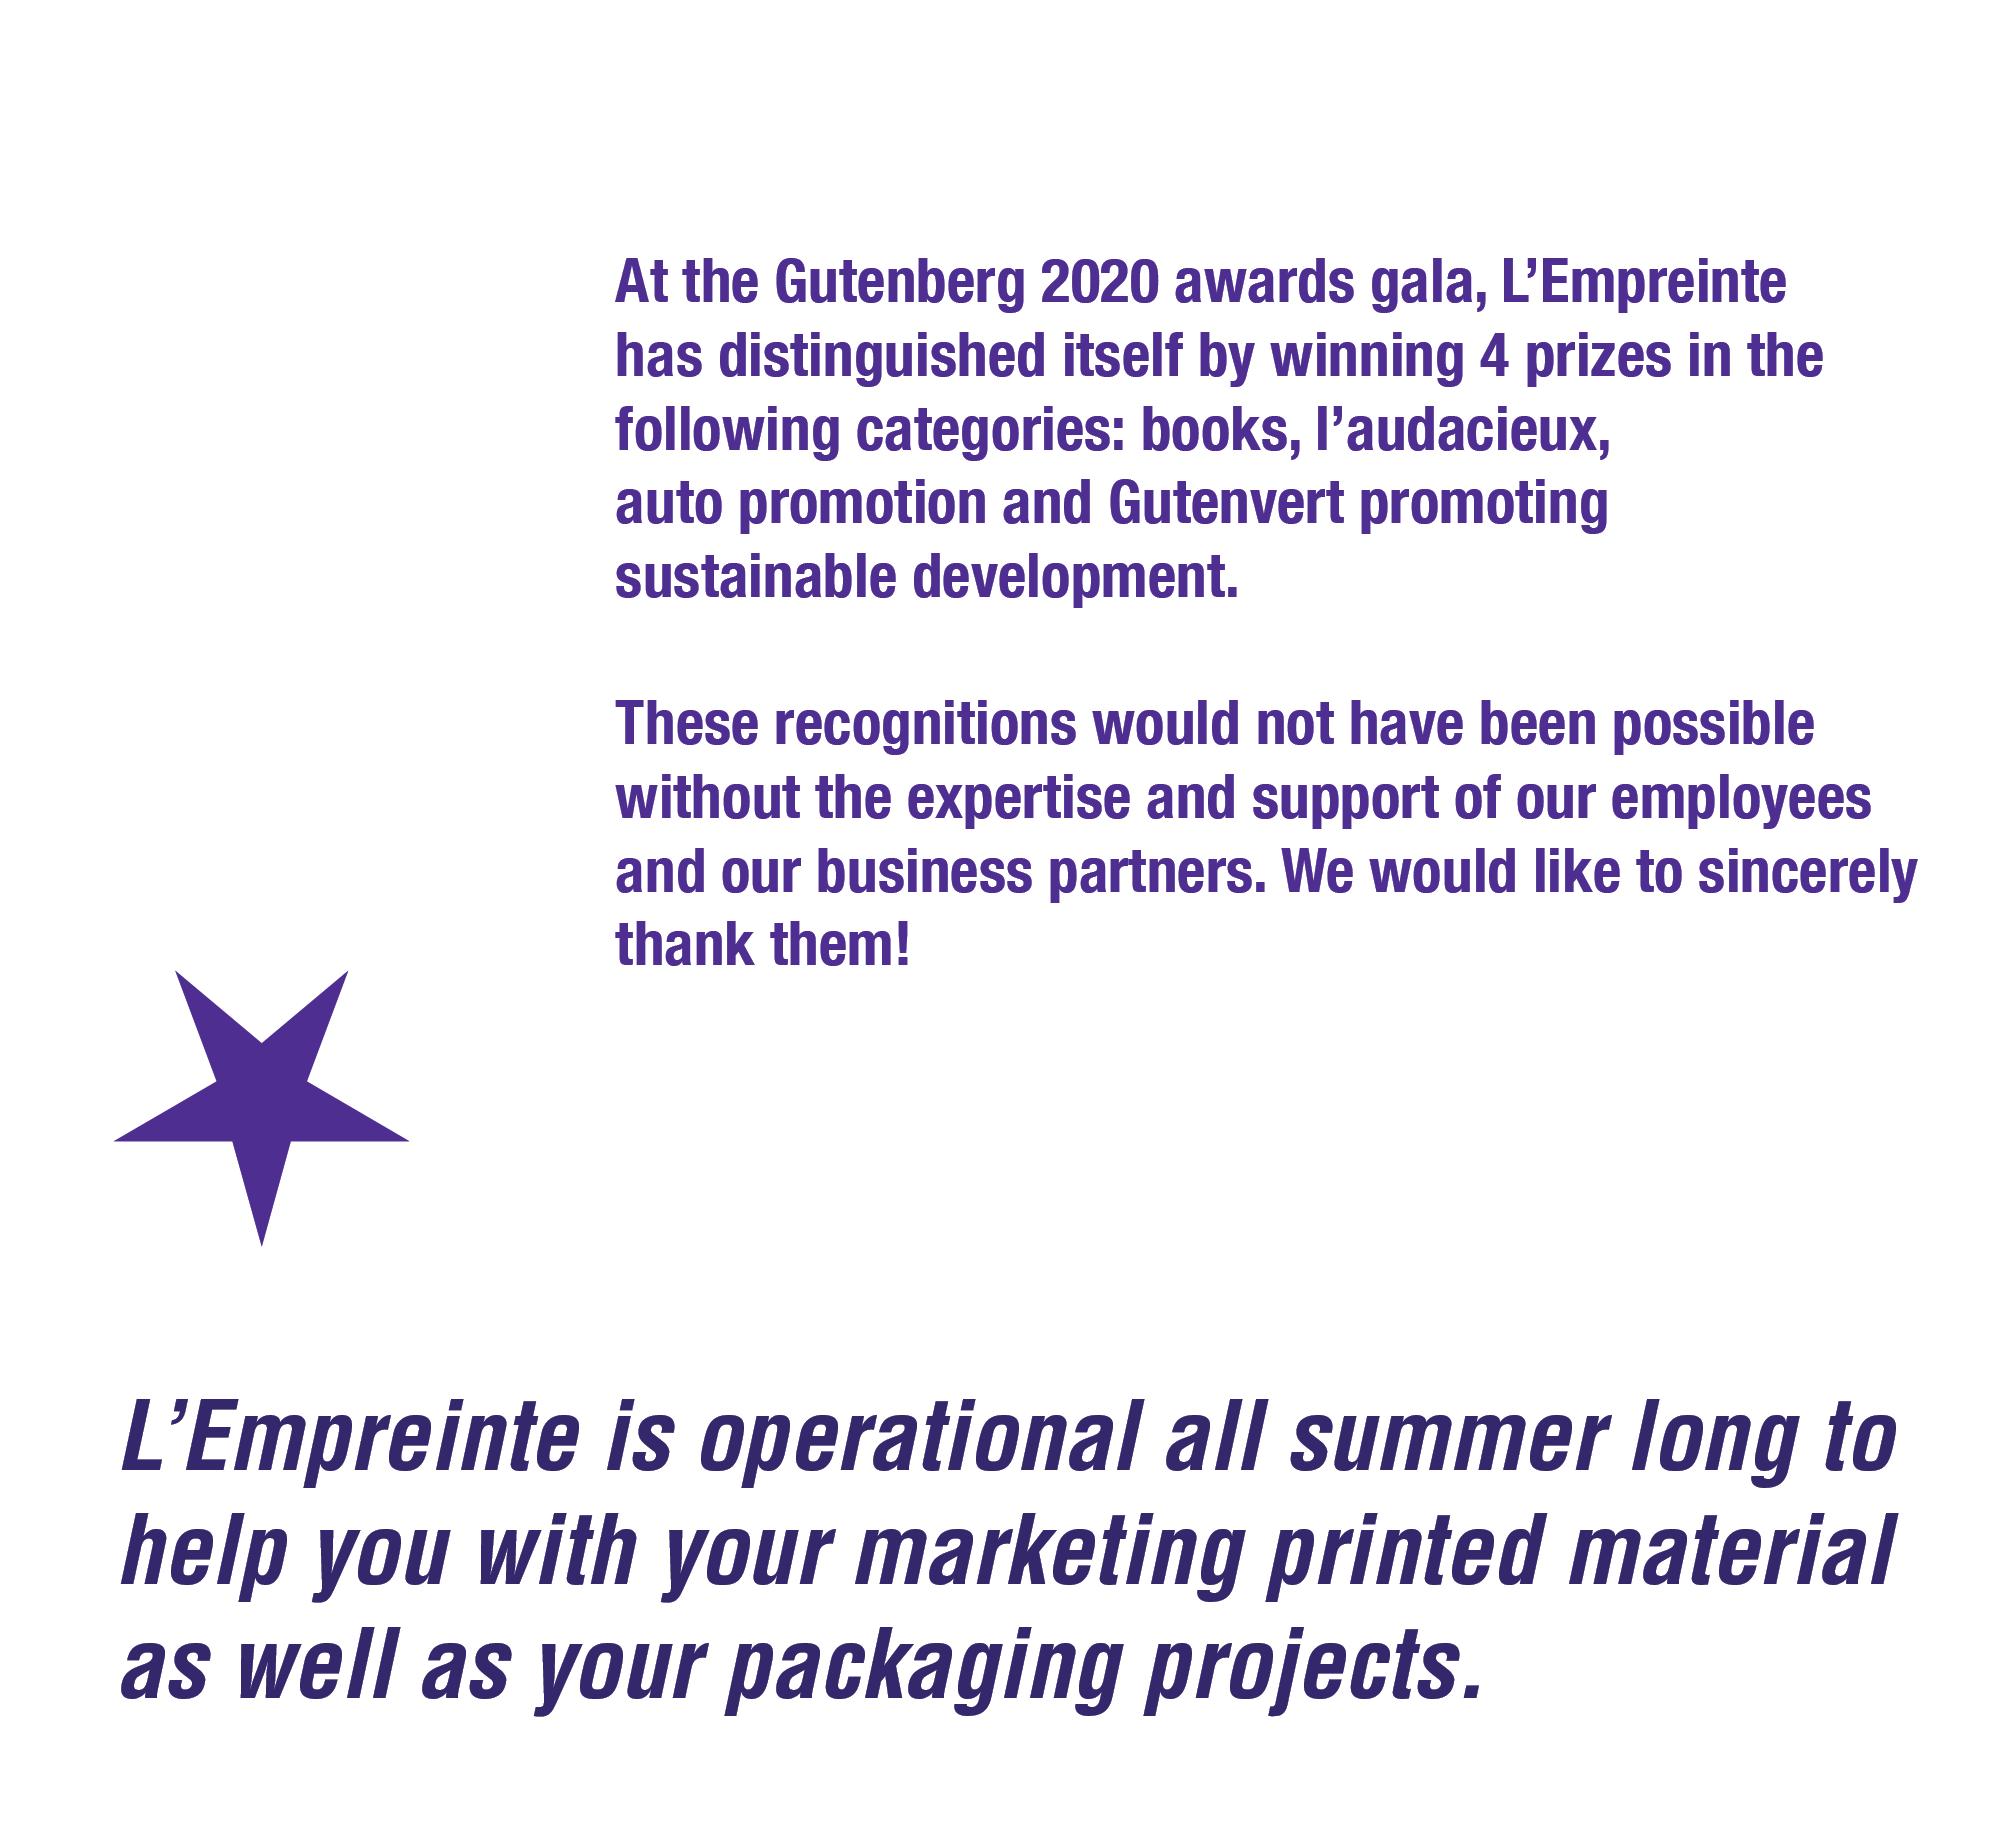 L'Empreinte is operational all summer